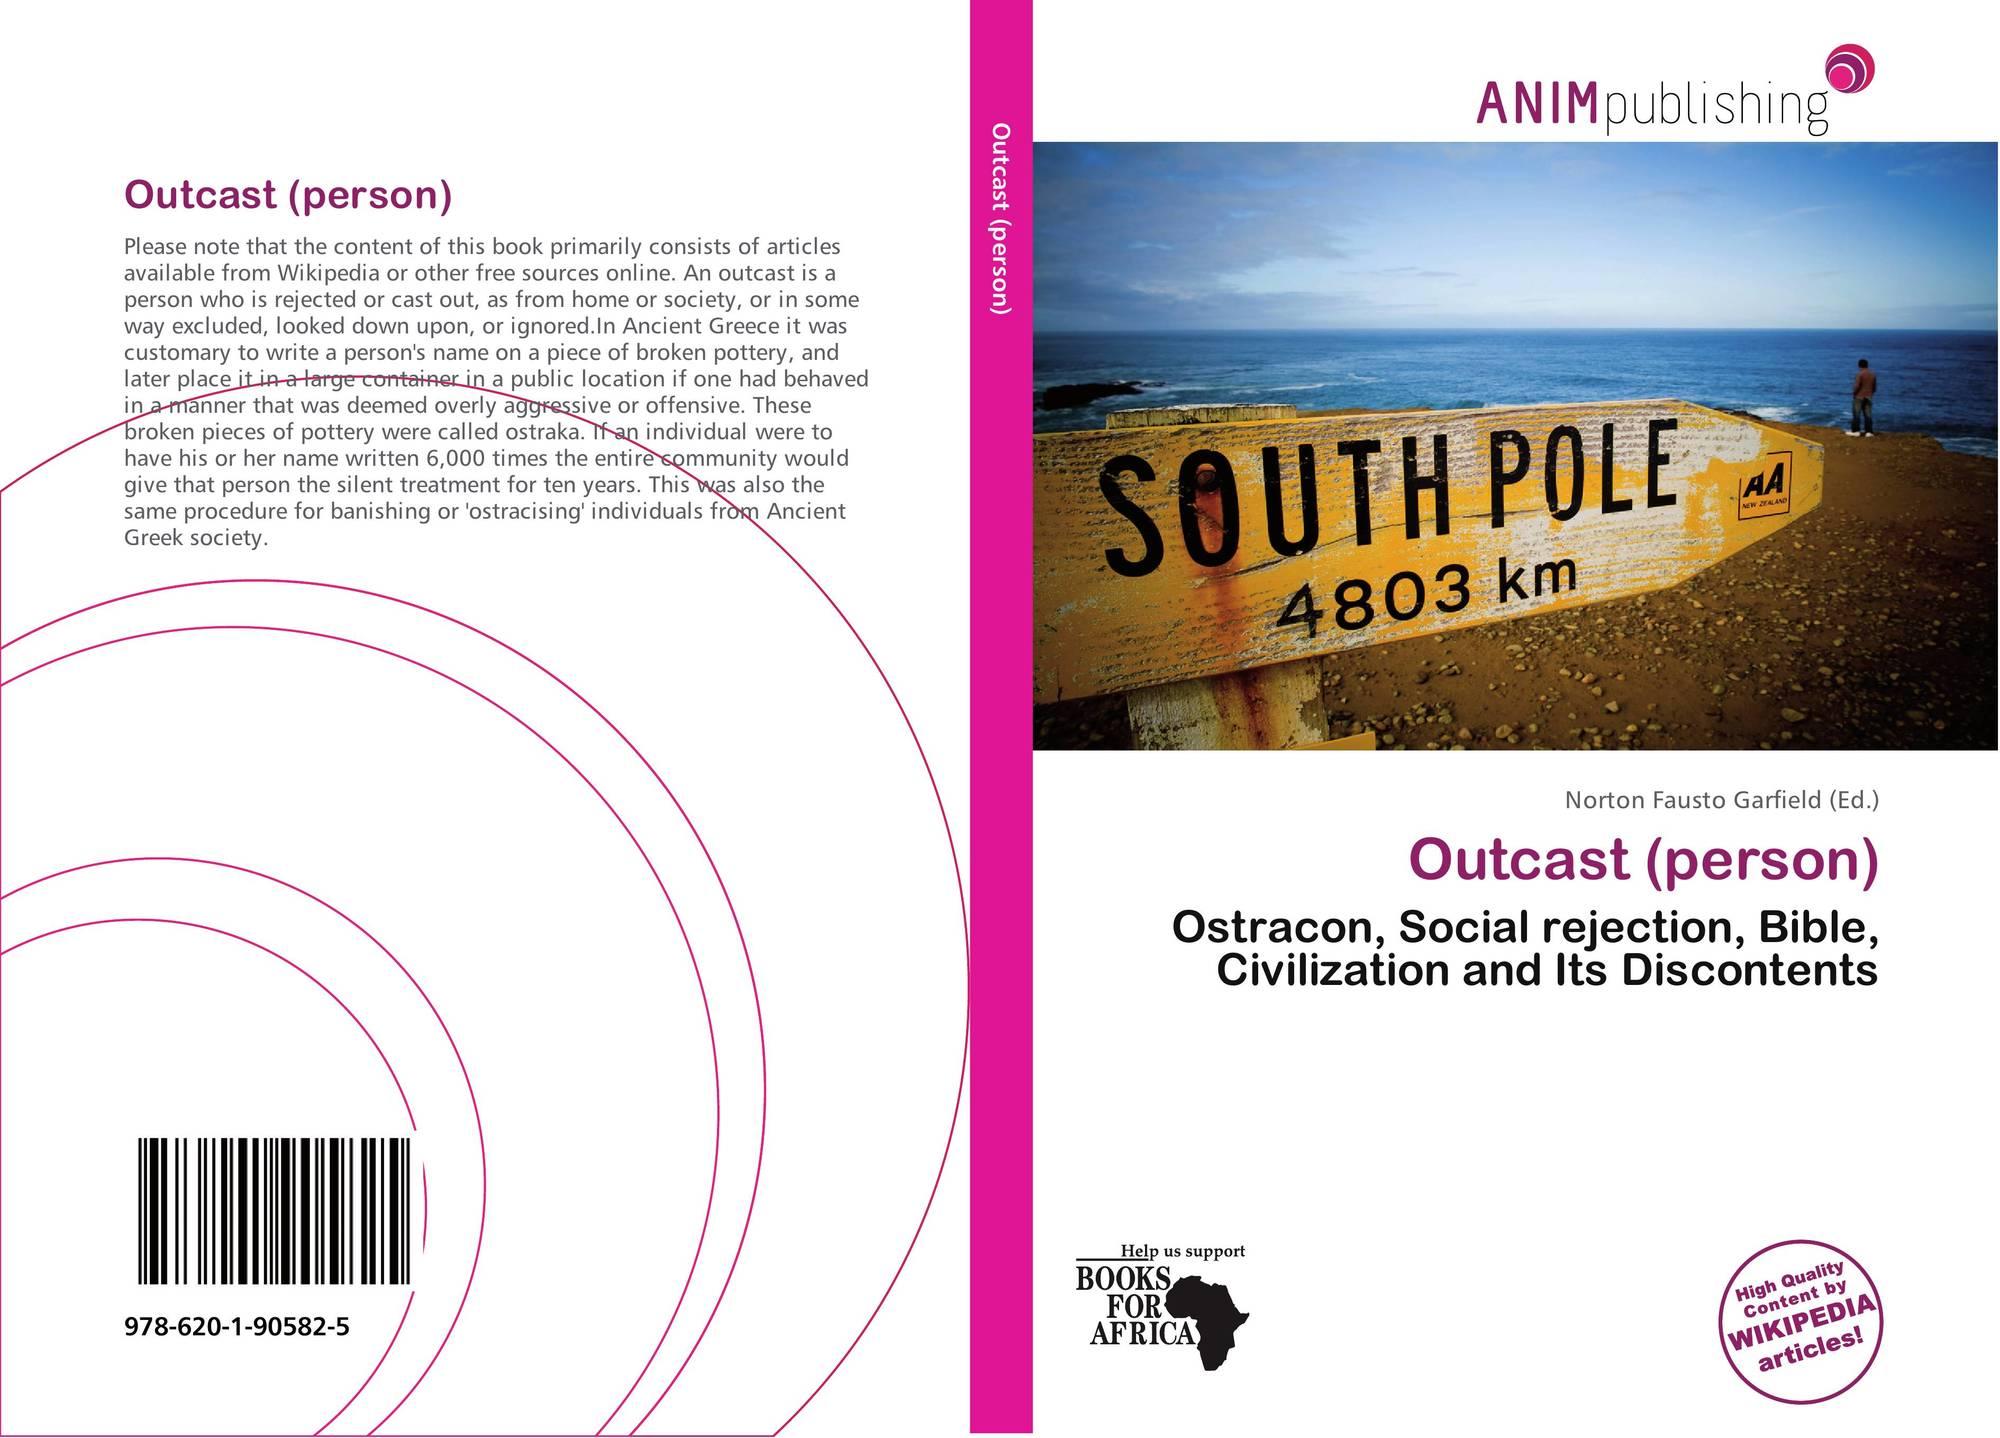 Outcast (person), 978-620-1-90582-5, 6201905820 ,9786201905825